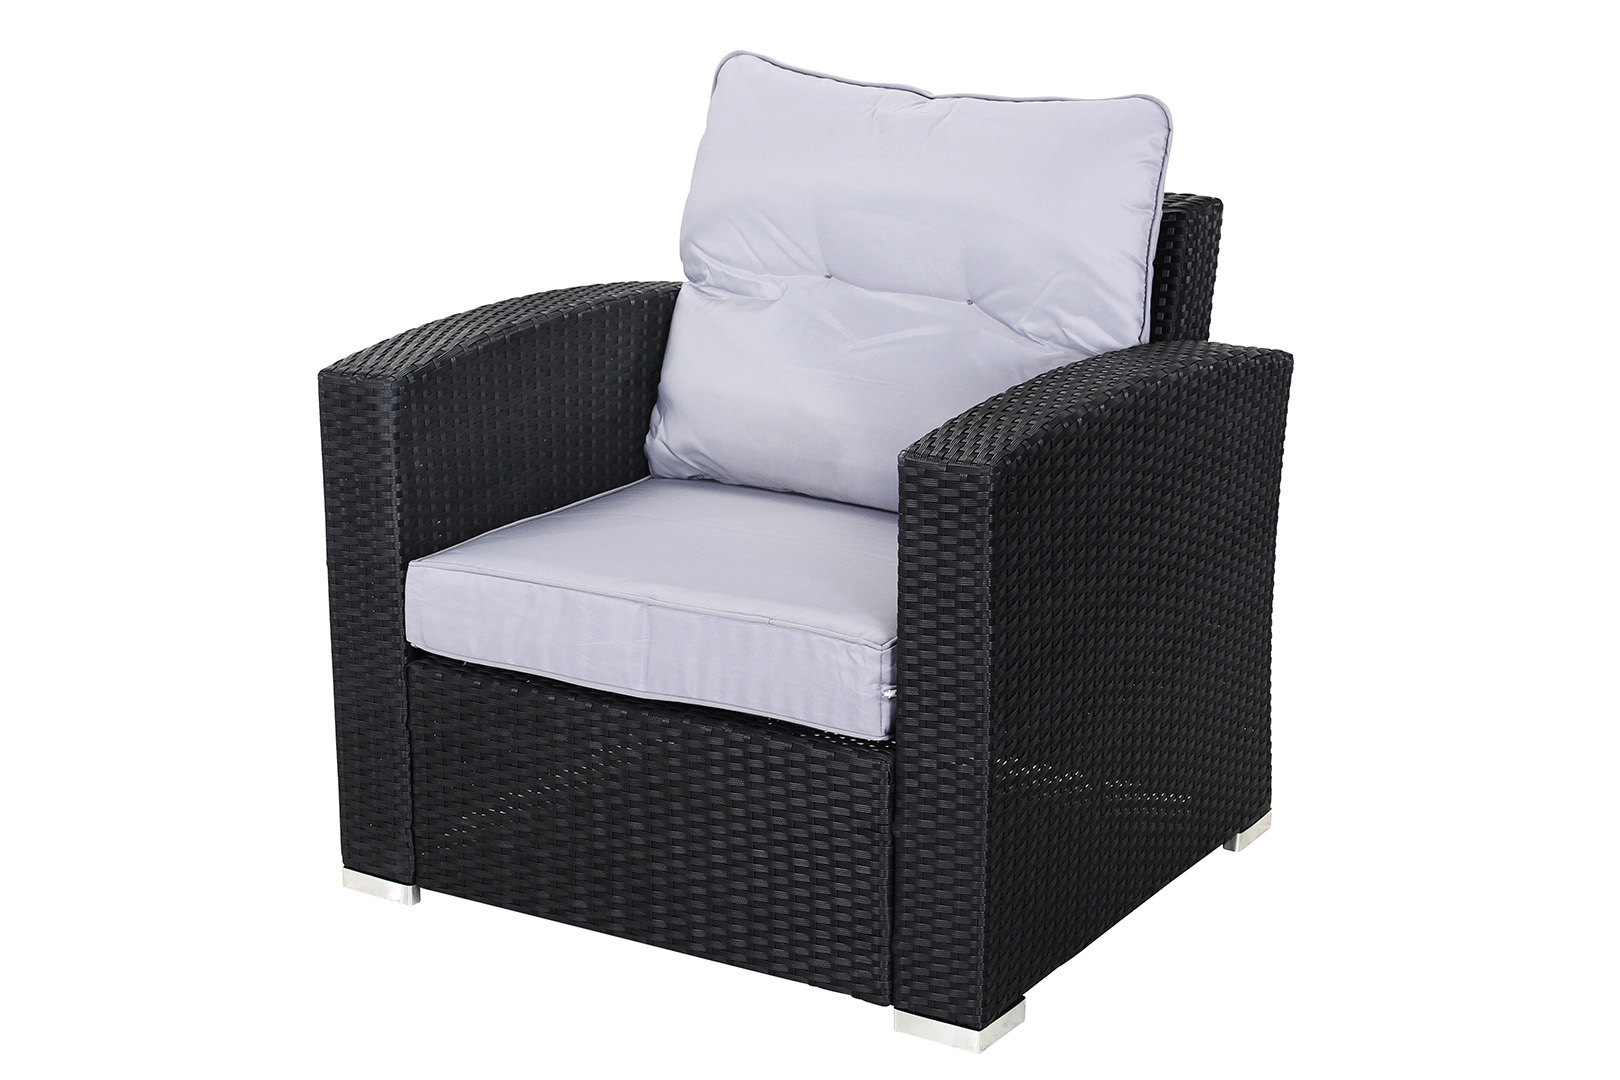 quadfactory bottrop miweba caribbian polyrattan. Black Bedroom Furniture Sets. Home Design Ideas